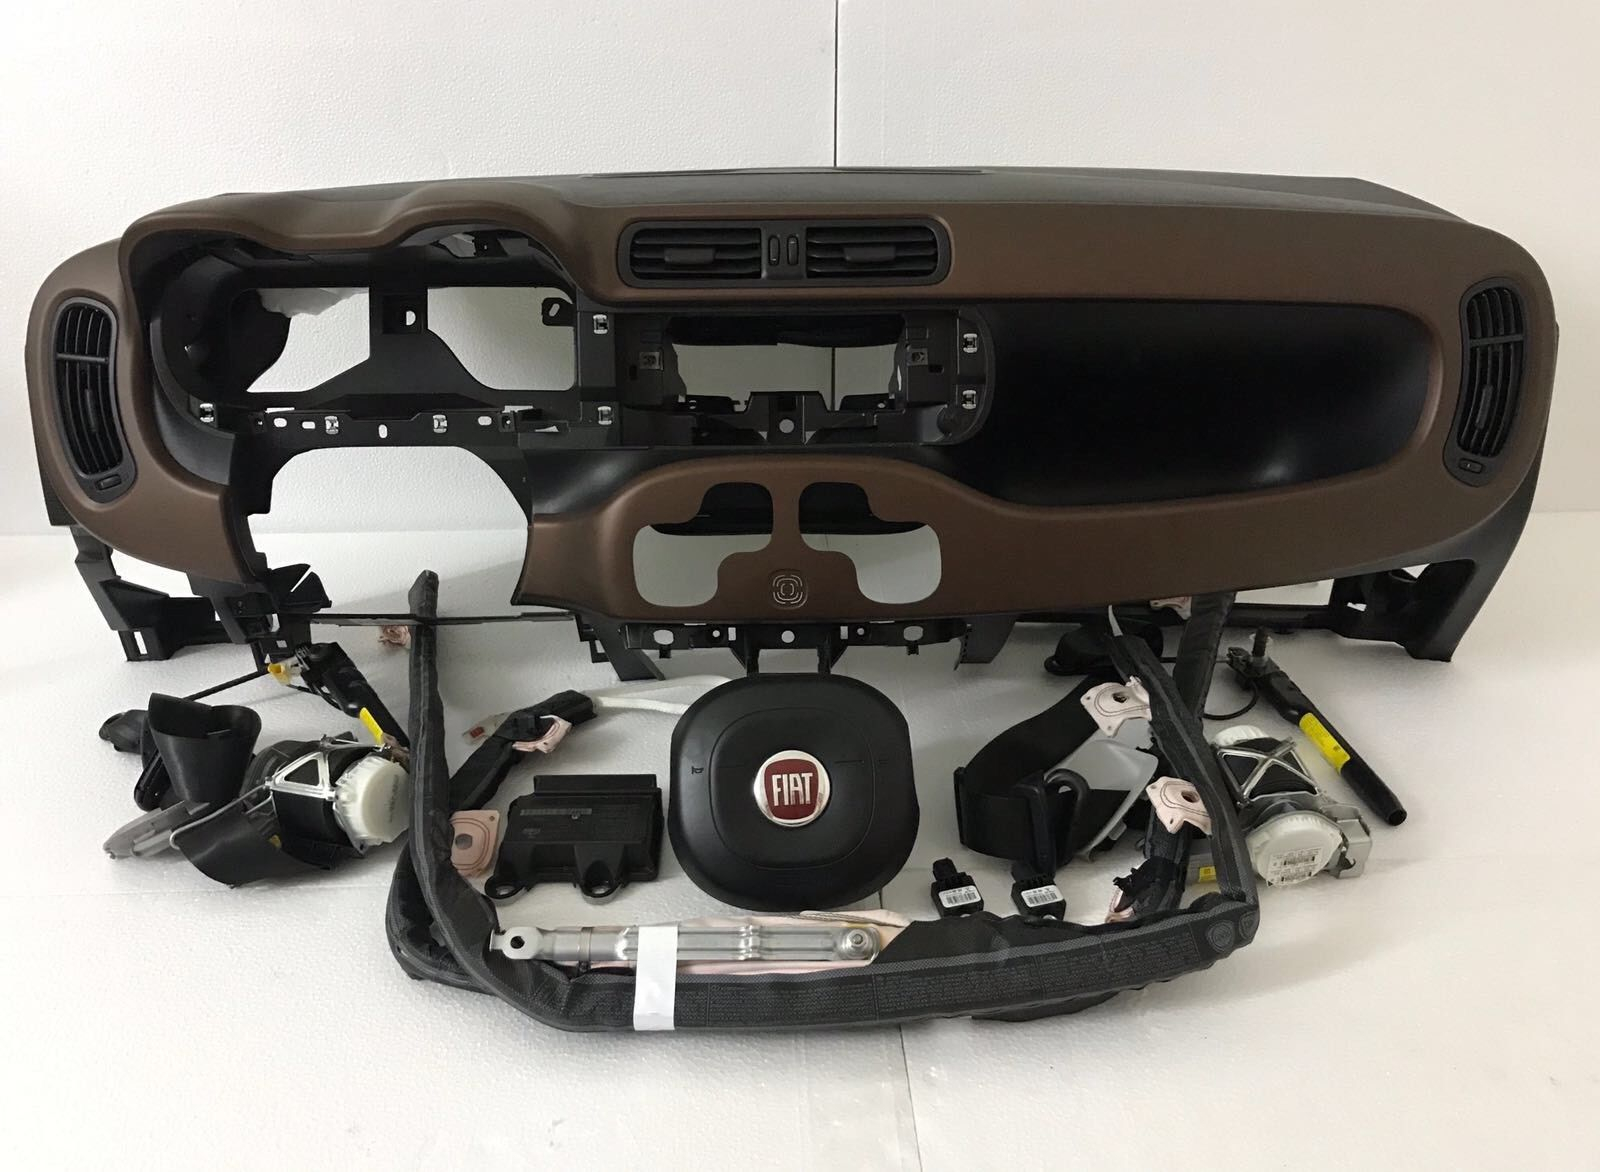 Kit Airbag Completo Fiat Panda Anno 2016 Originale